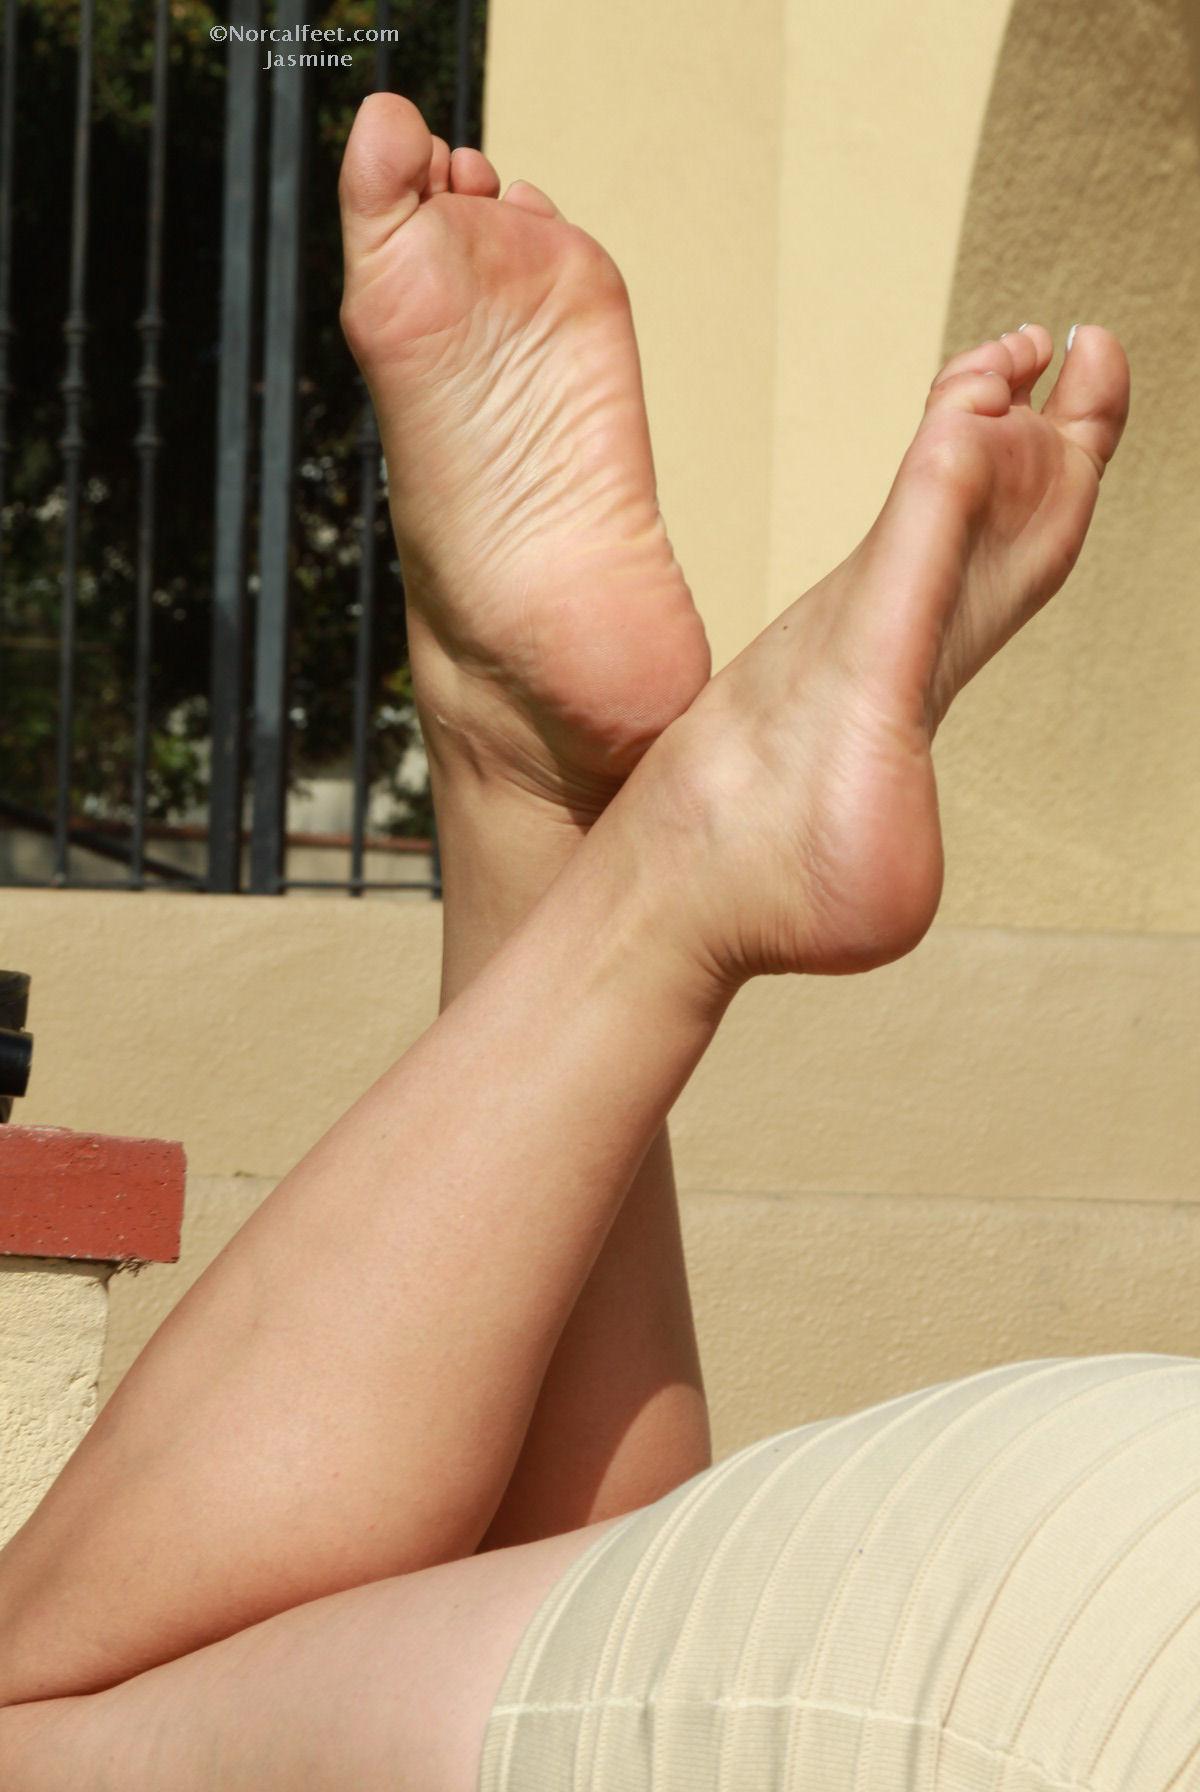 gay feet jasmine mendez